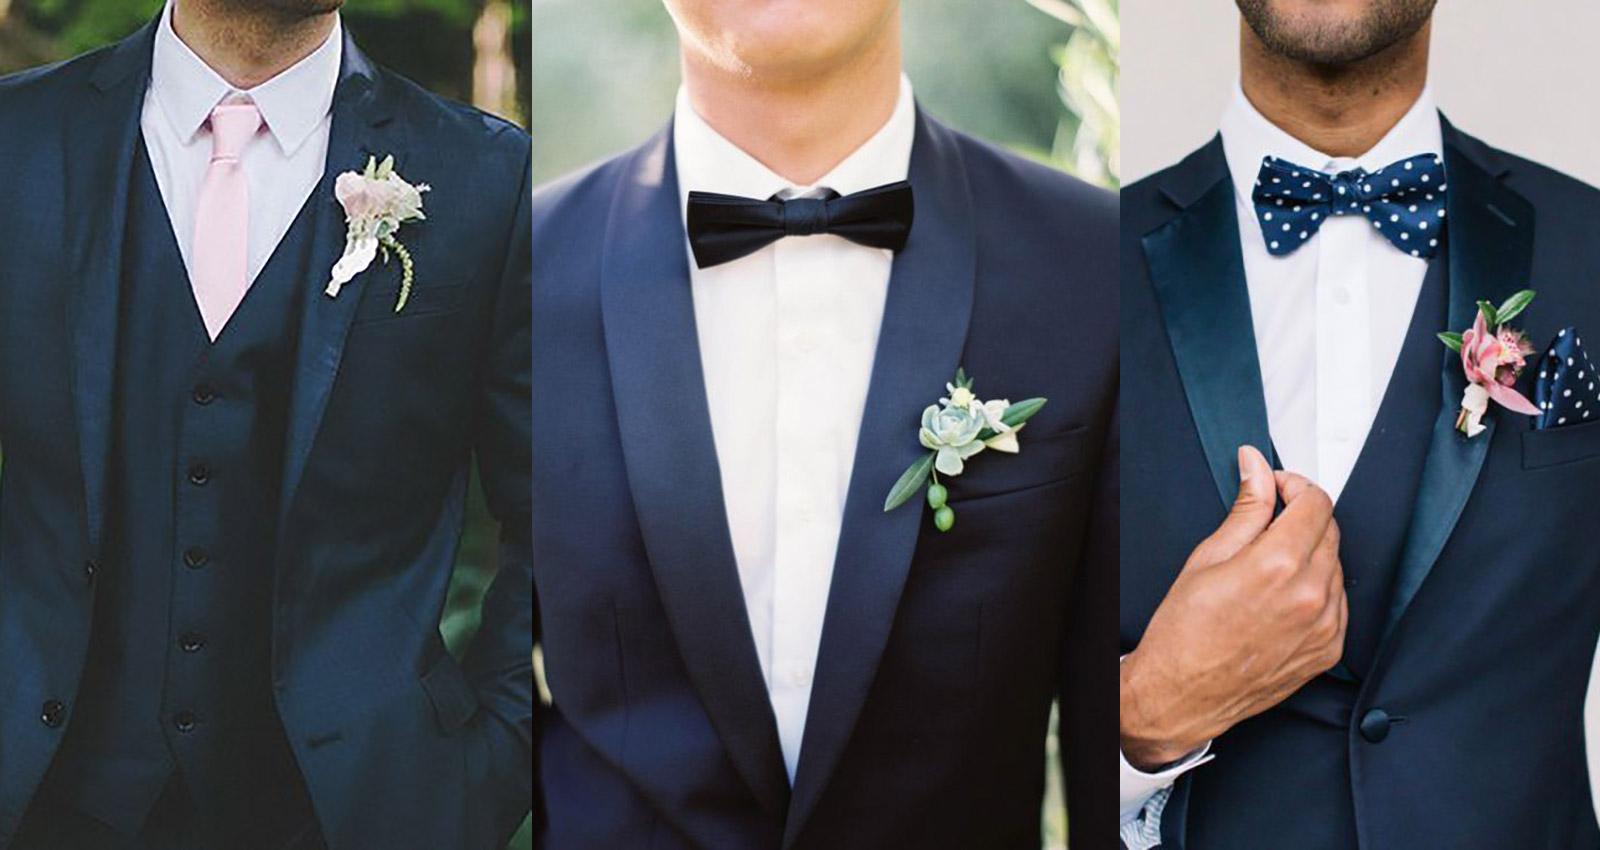 niebieskie granatowe garnitury ślubne 2019